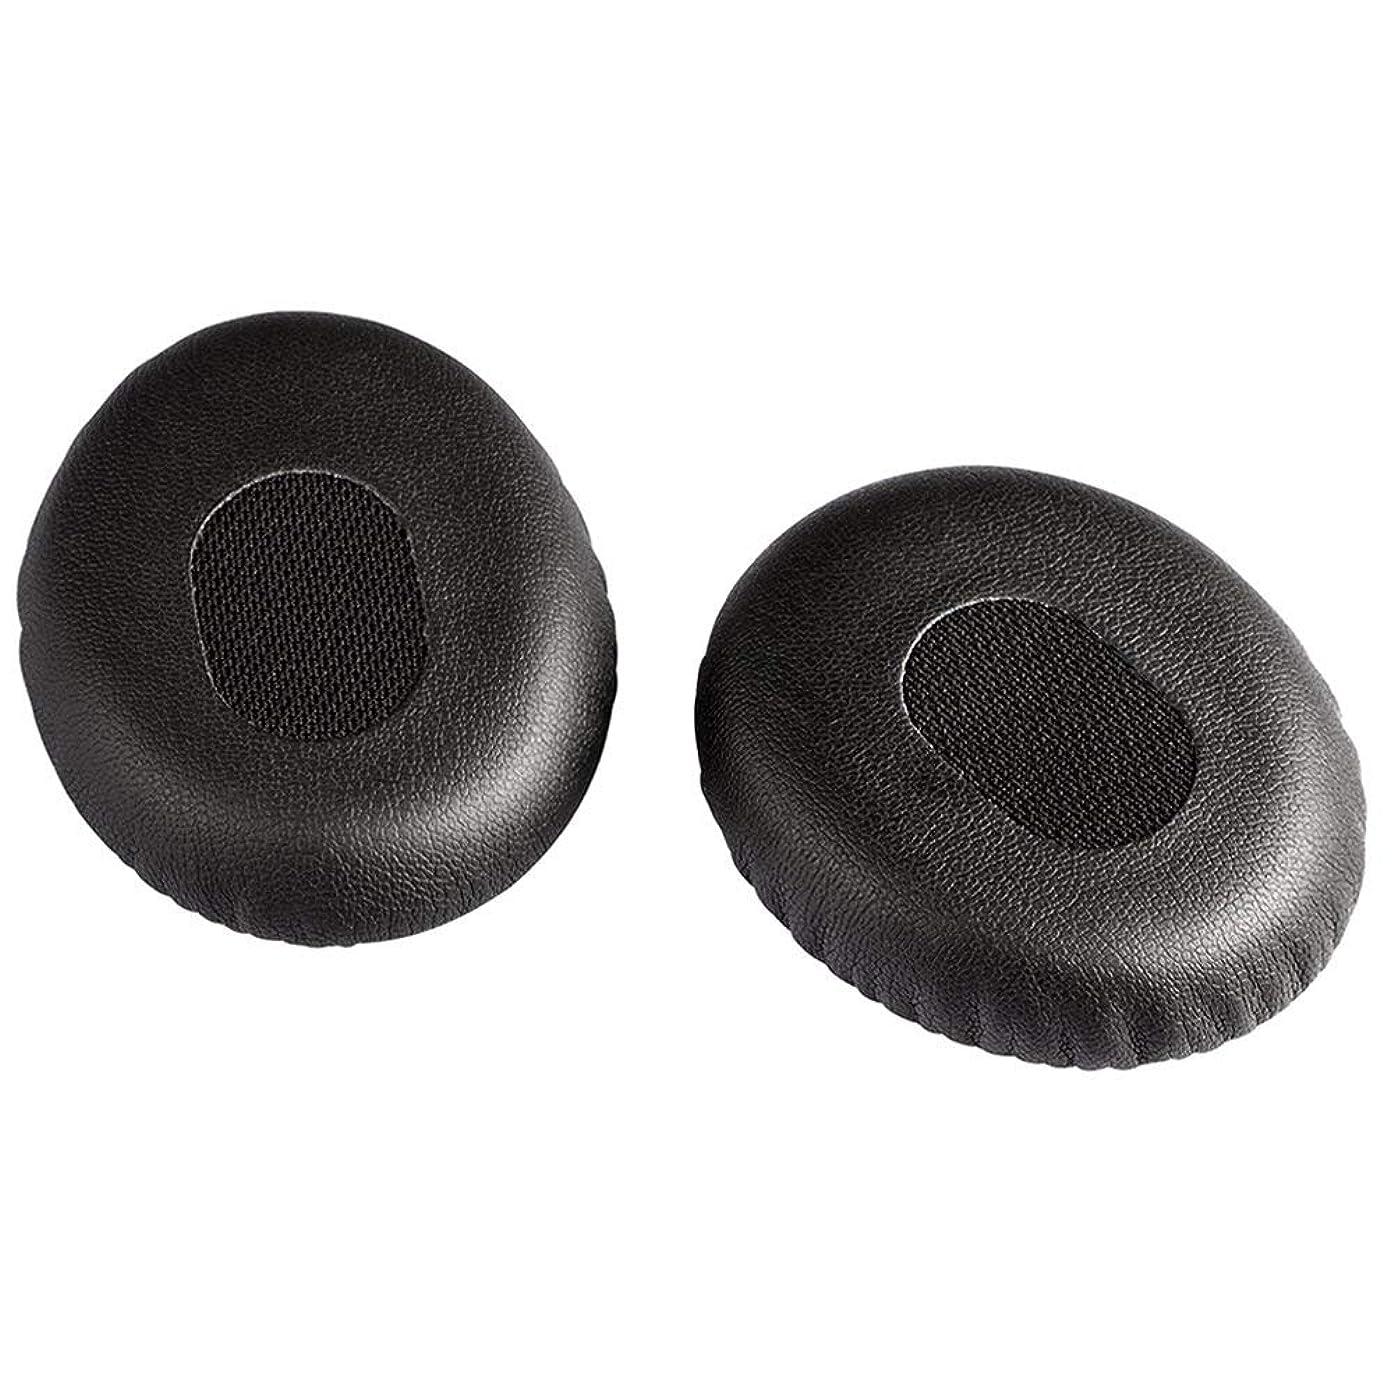 Earpads Ear Cushions for Bose On-Ear OE/ OE1 QC3 Headphone - Replacement Memory Foam Ear Cushion Pads Earpads Ear Cups for Bose QuietComfort3 (1Pair Black)